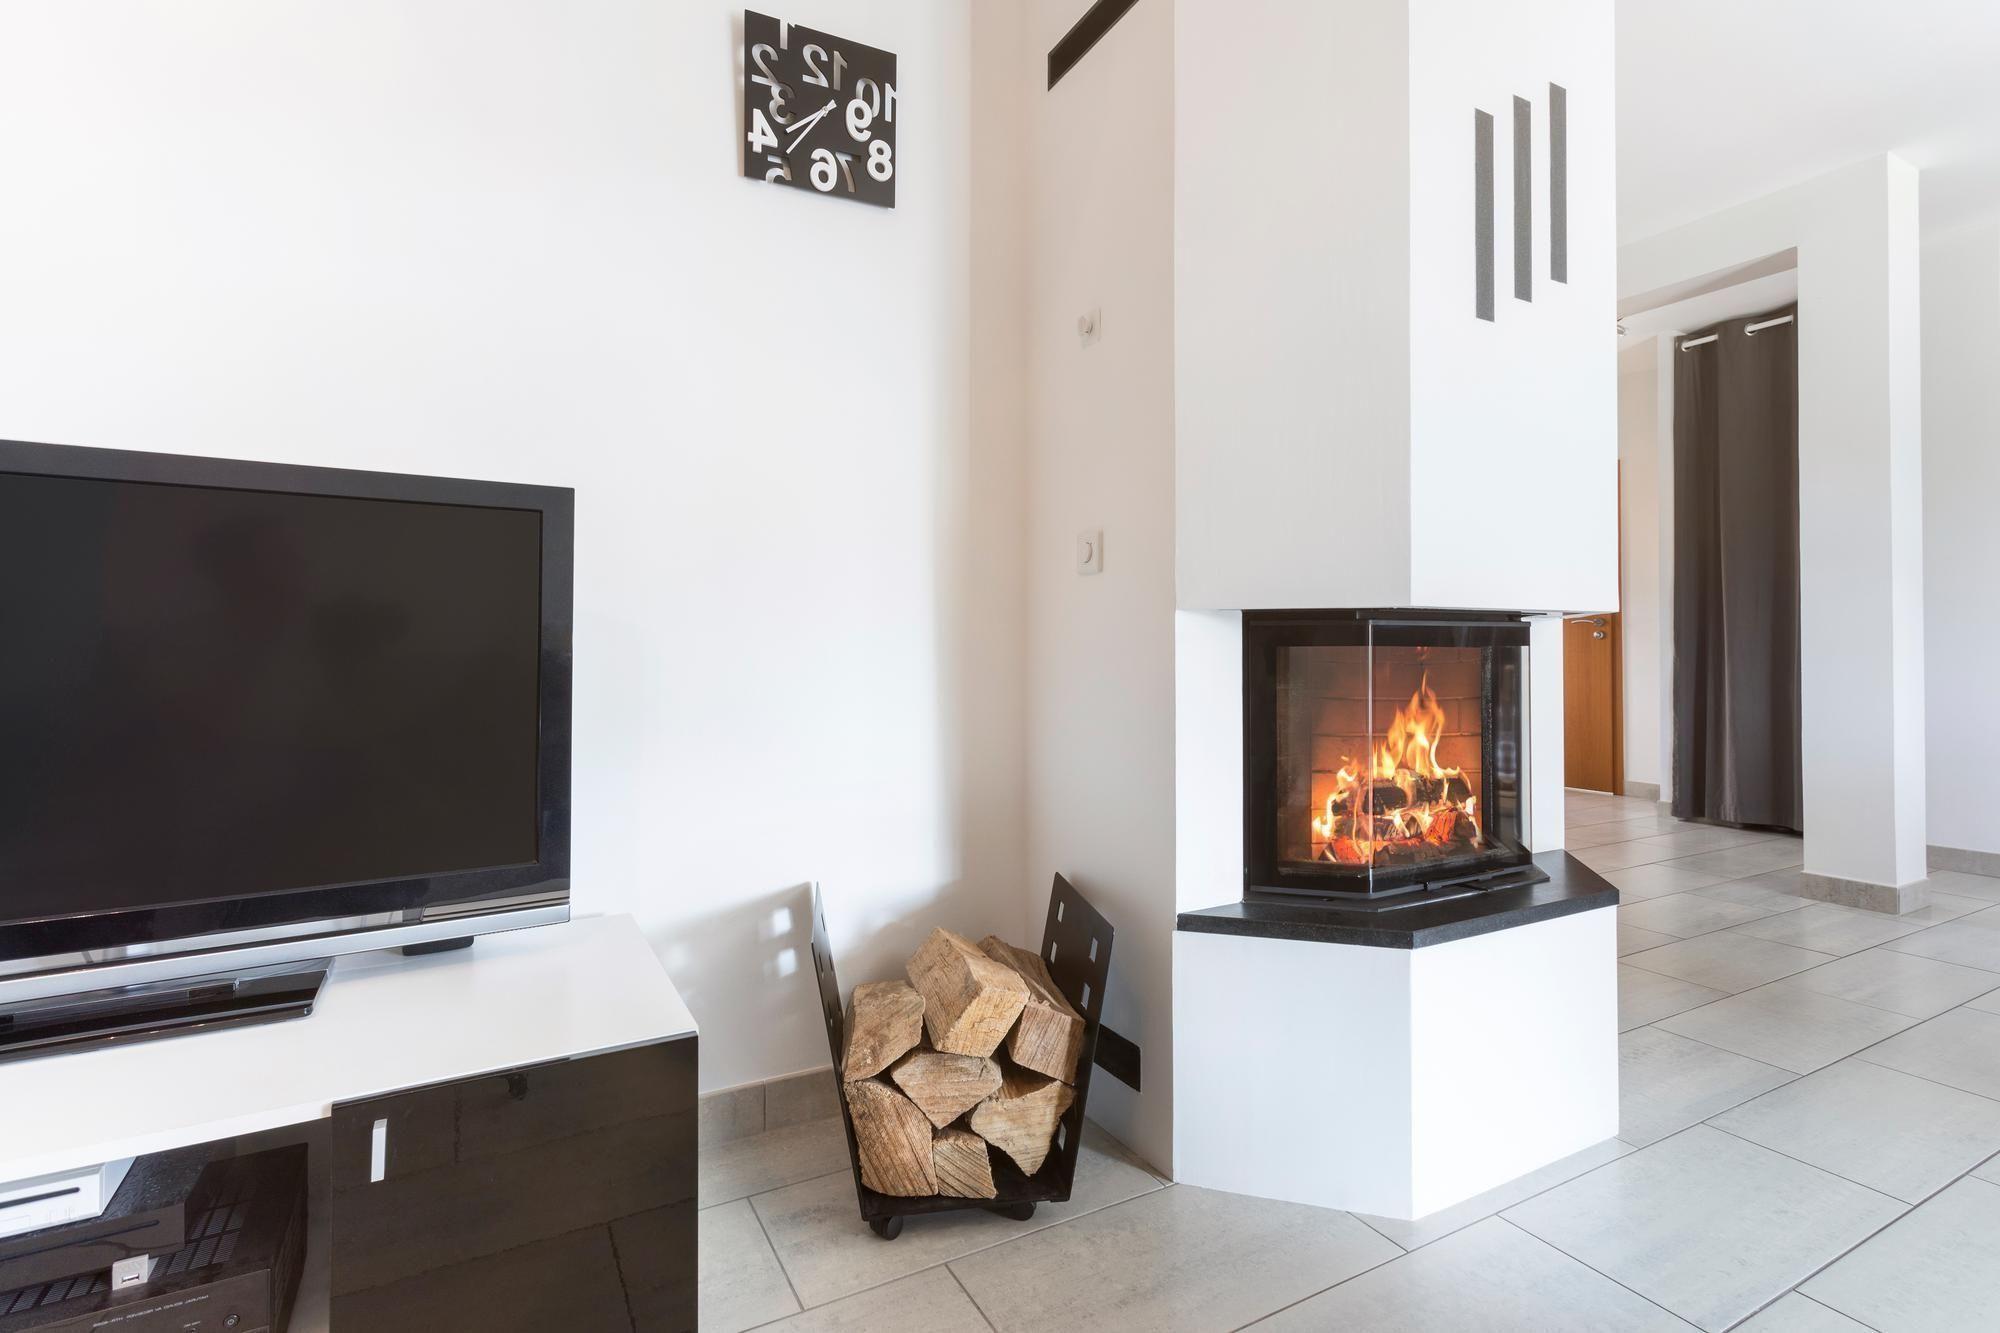 Fireplaces - Fireplaces - Cheminée / Kamin / Ofen